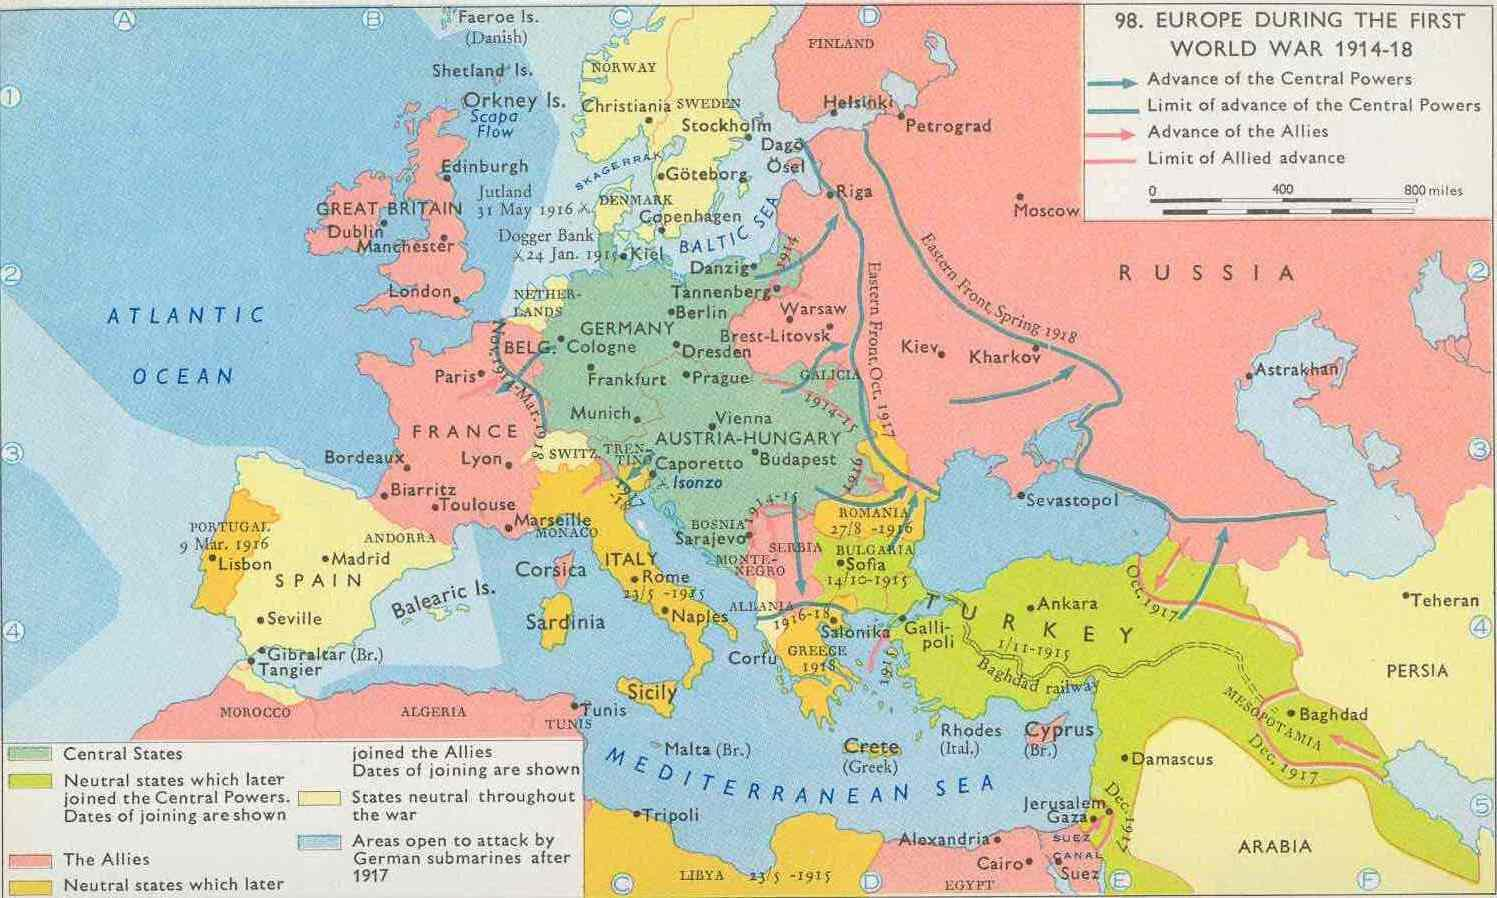 Europe During First World War Map